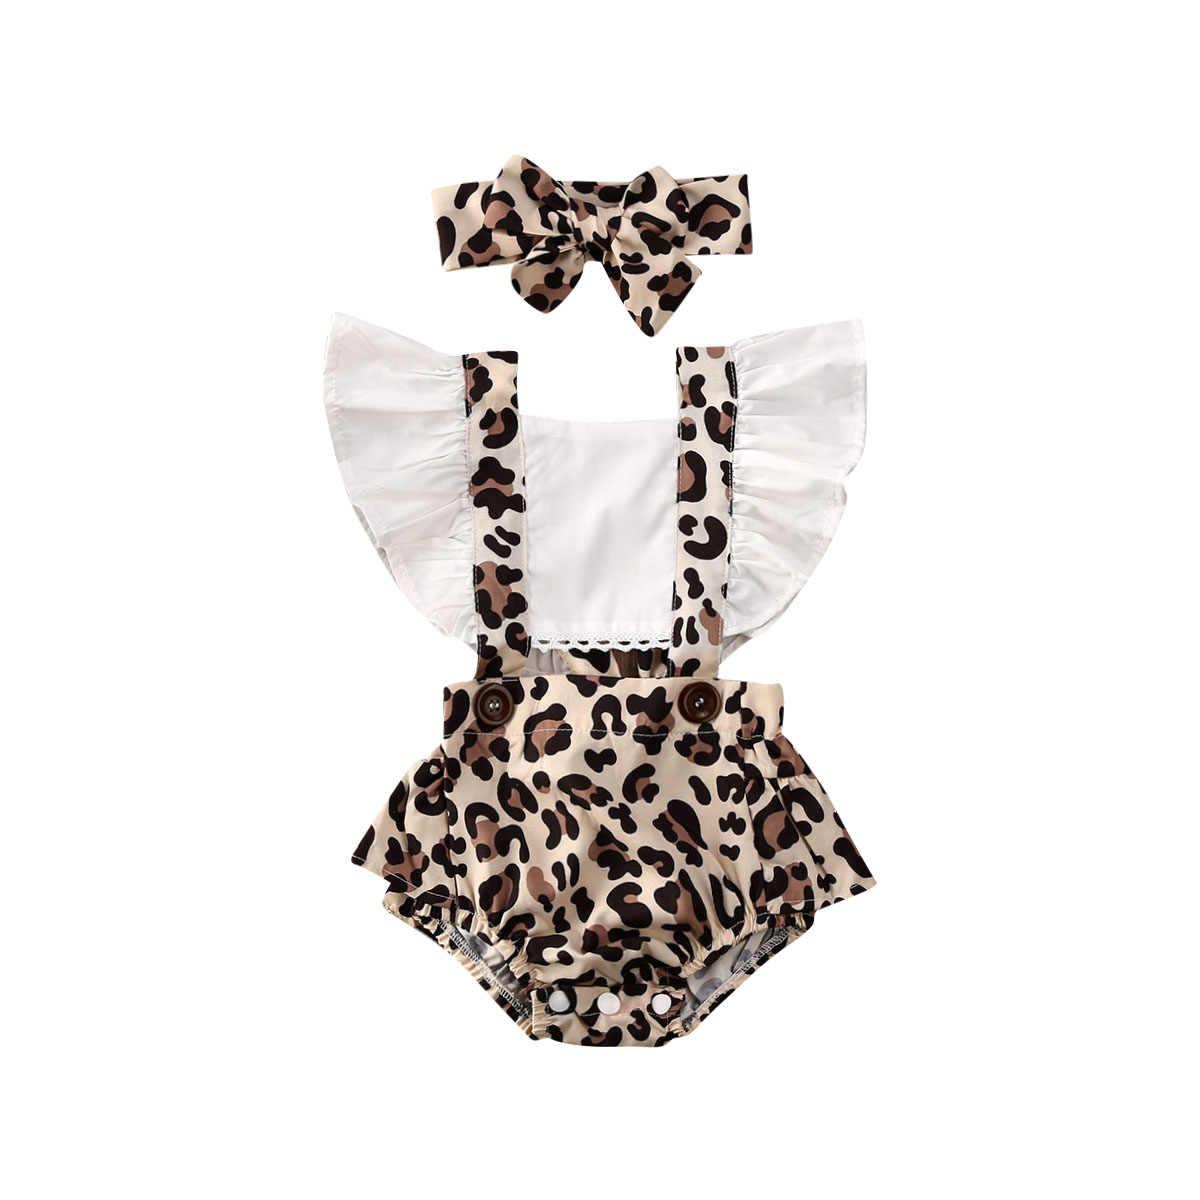 0-24M Bayi Gadis Bunga Kerut-kerut Baju Monyet Bayi Baru Lahir Backless Jumpsuit Headband Girls Sunsuit Pakaian 2Pcs Bayi Musim Panas pakaian